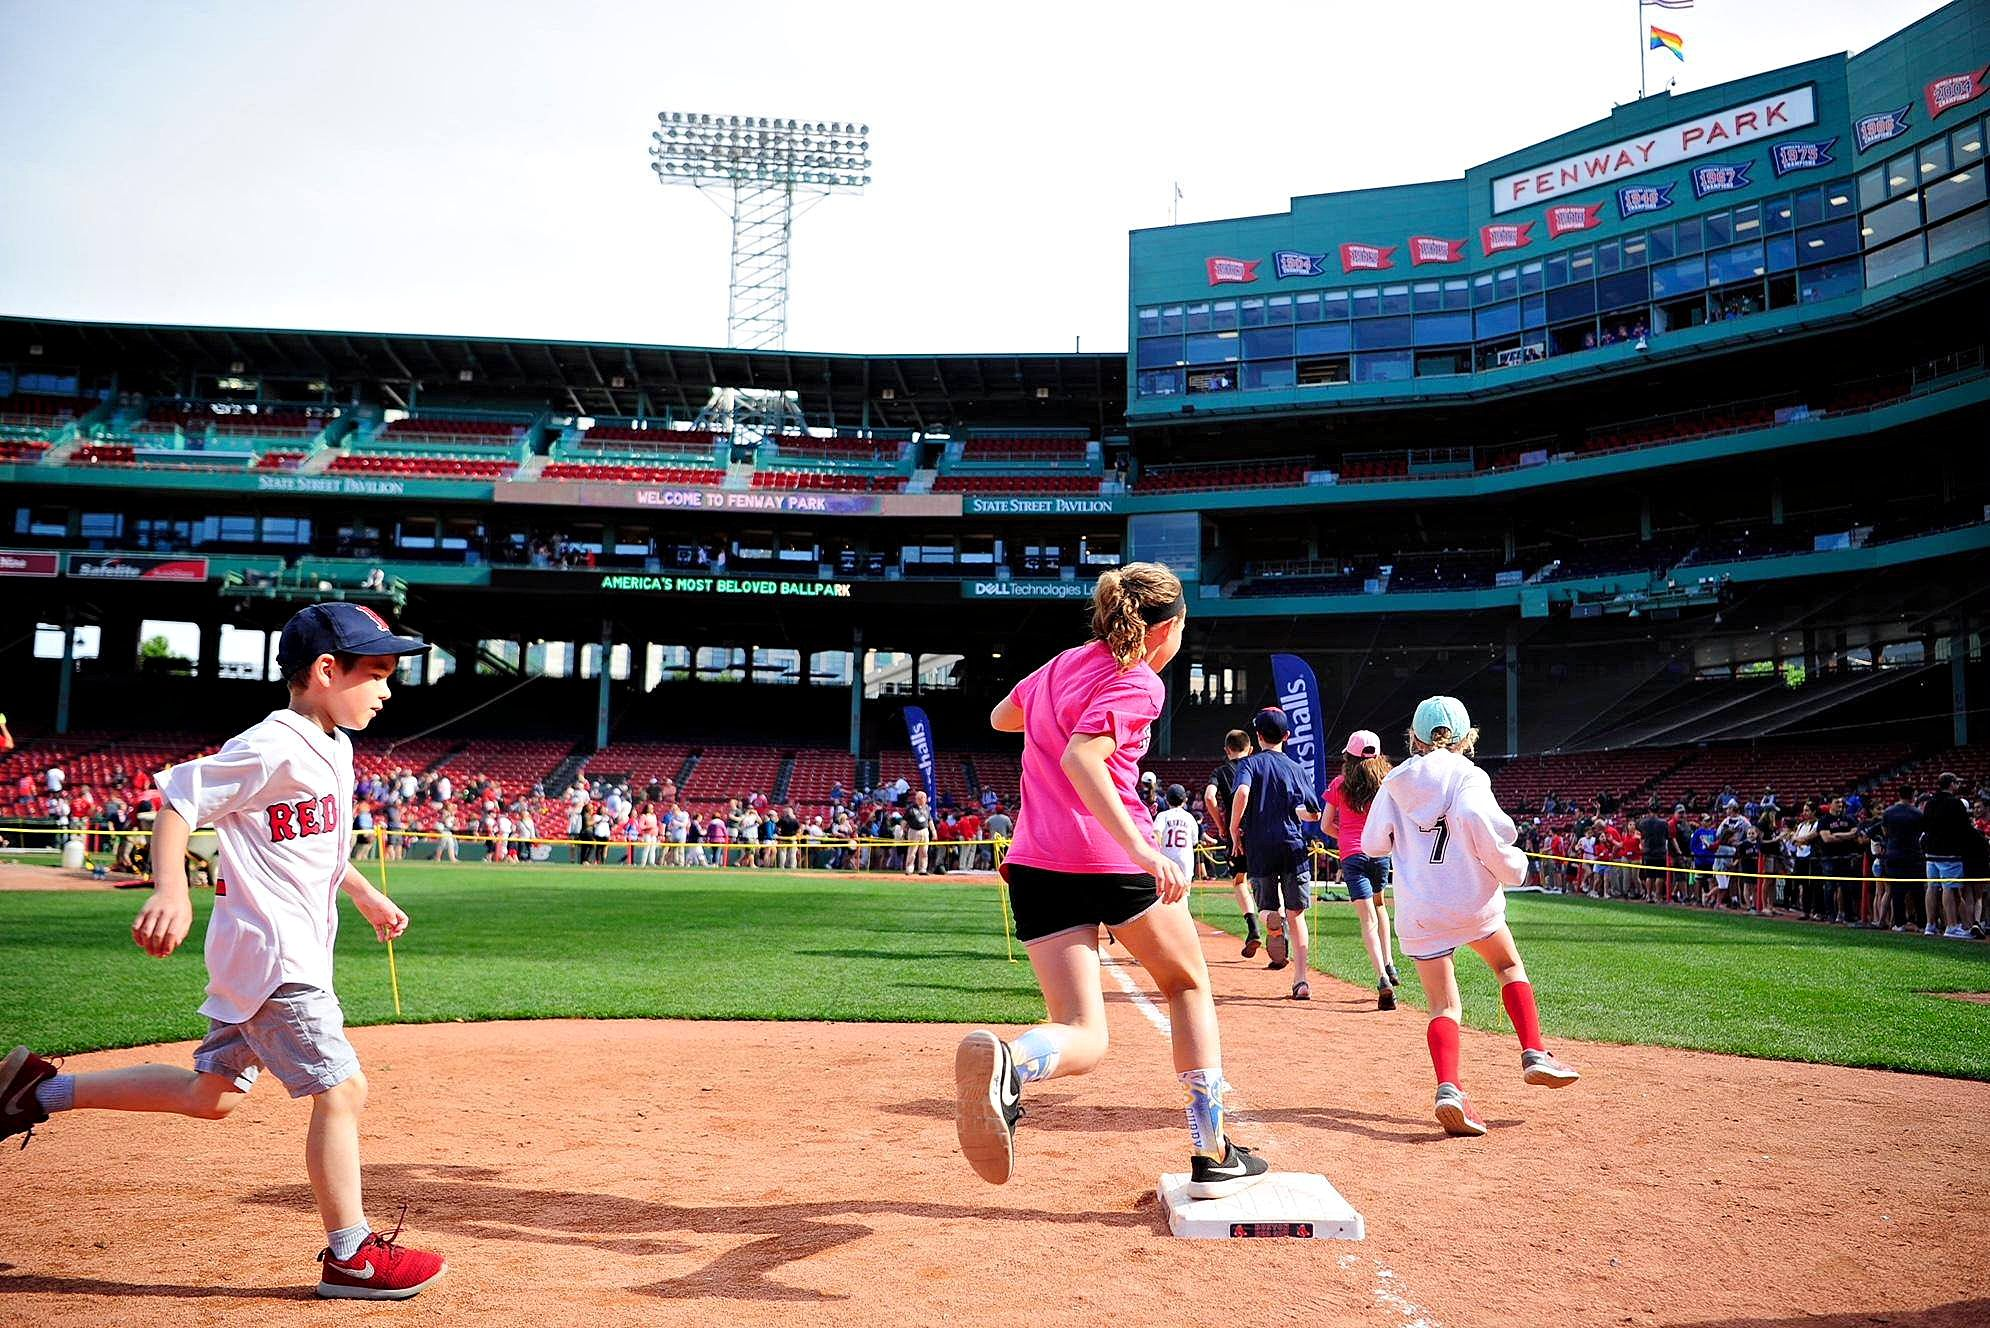 10 Touristy Things Even Boston Kids Love to Do Kids